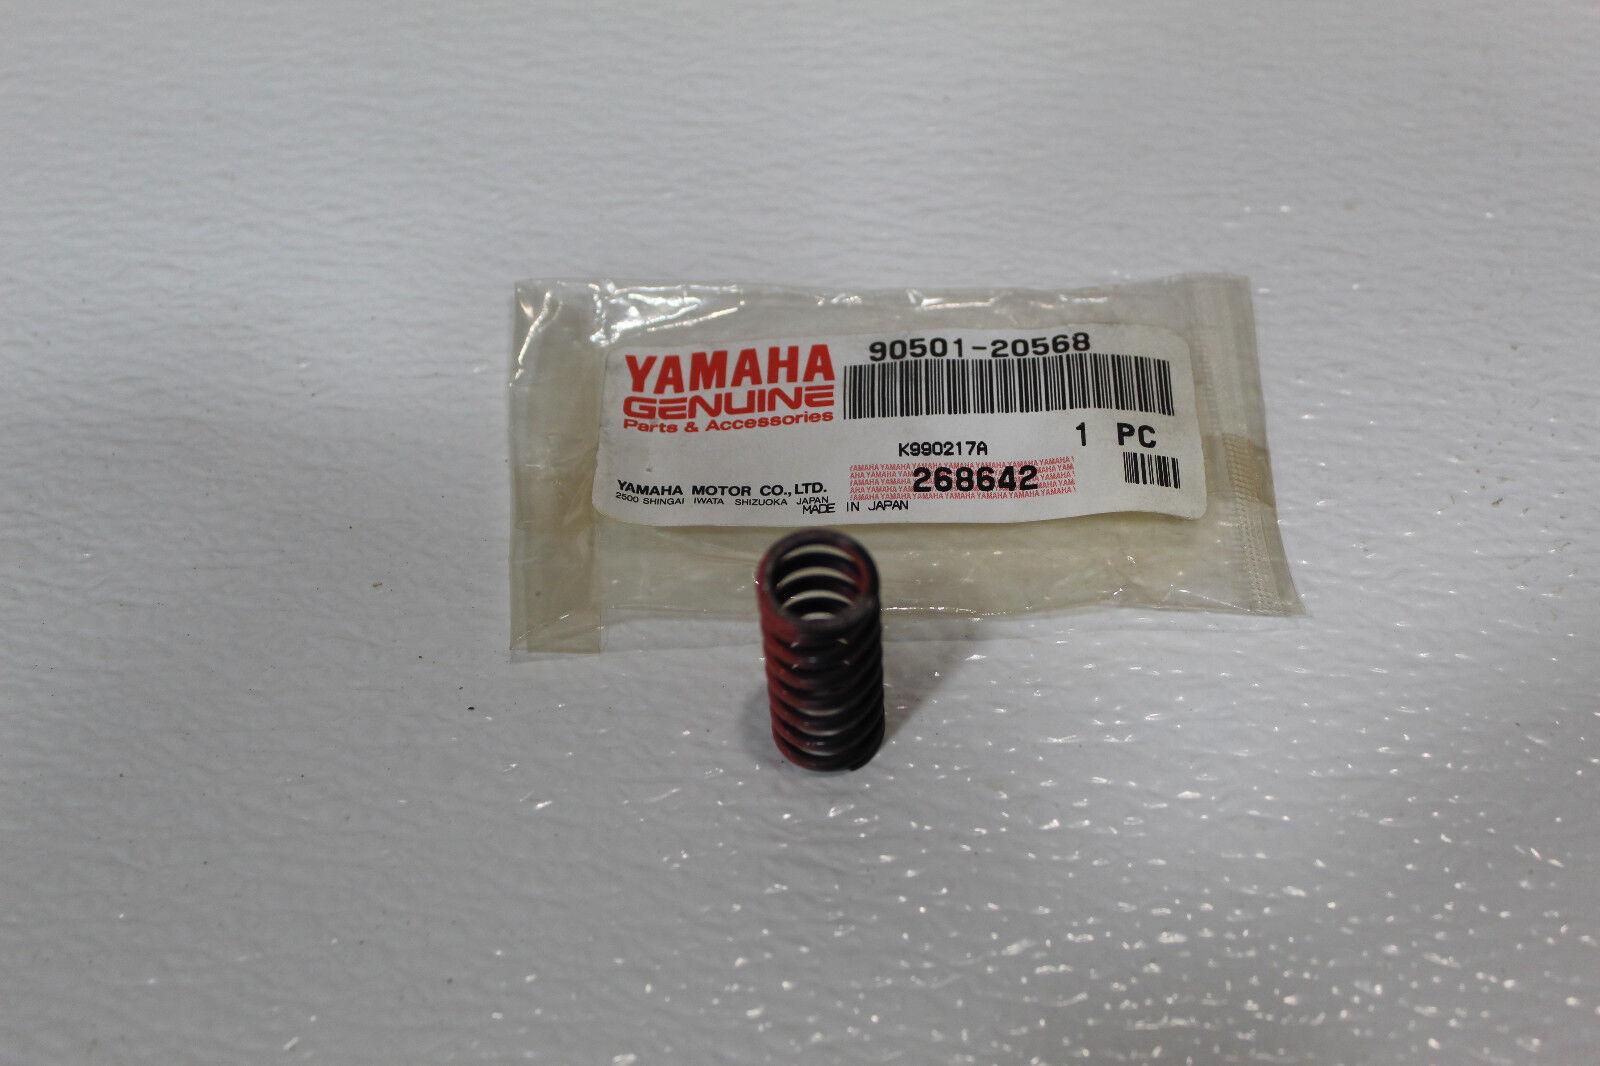 Blaster YFS200 OEM Yamaha 90501-20568-00 SPRING COMPRESSION